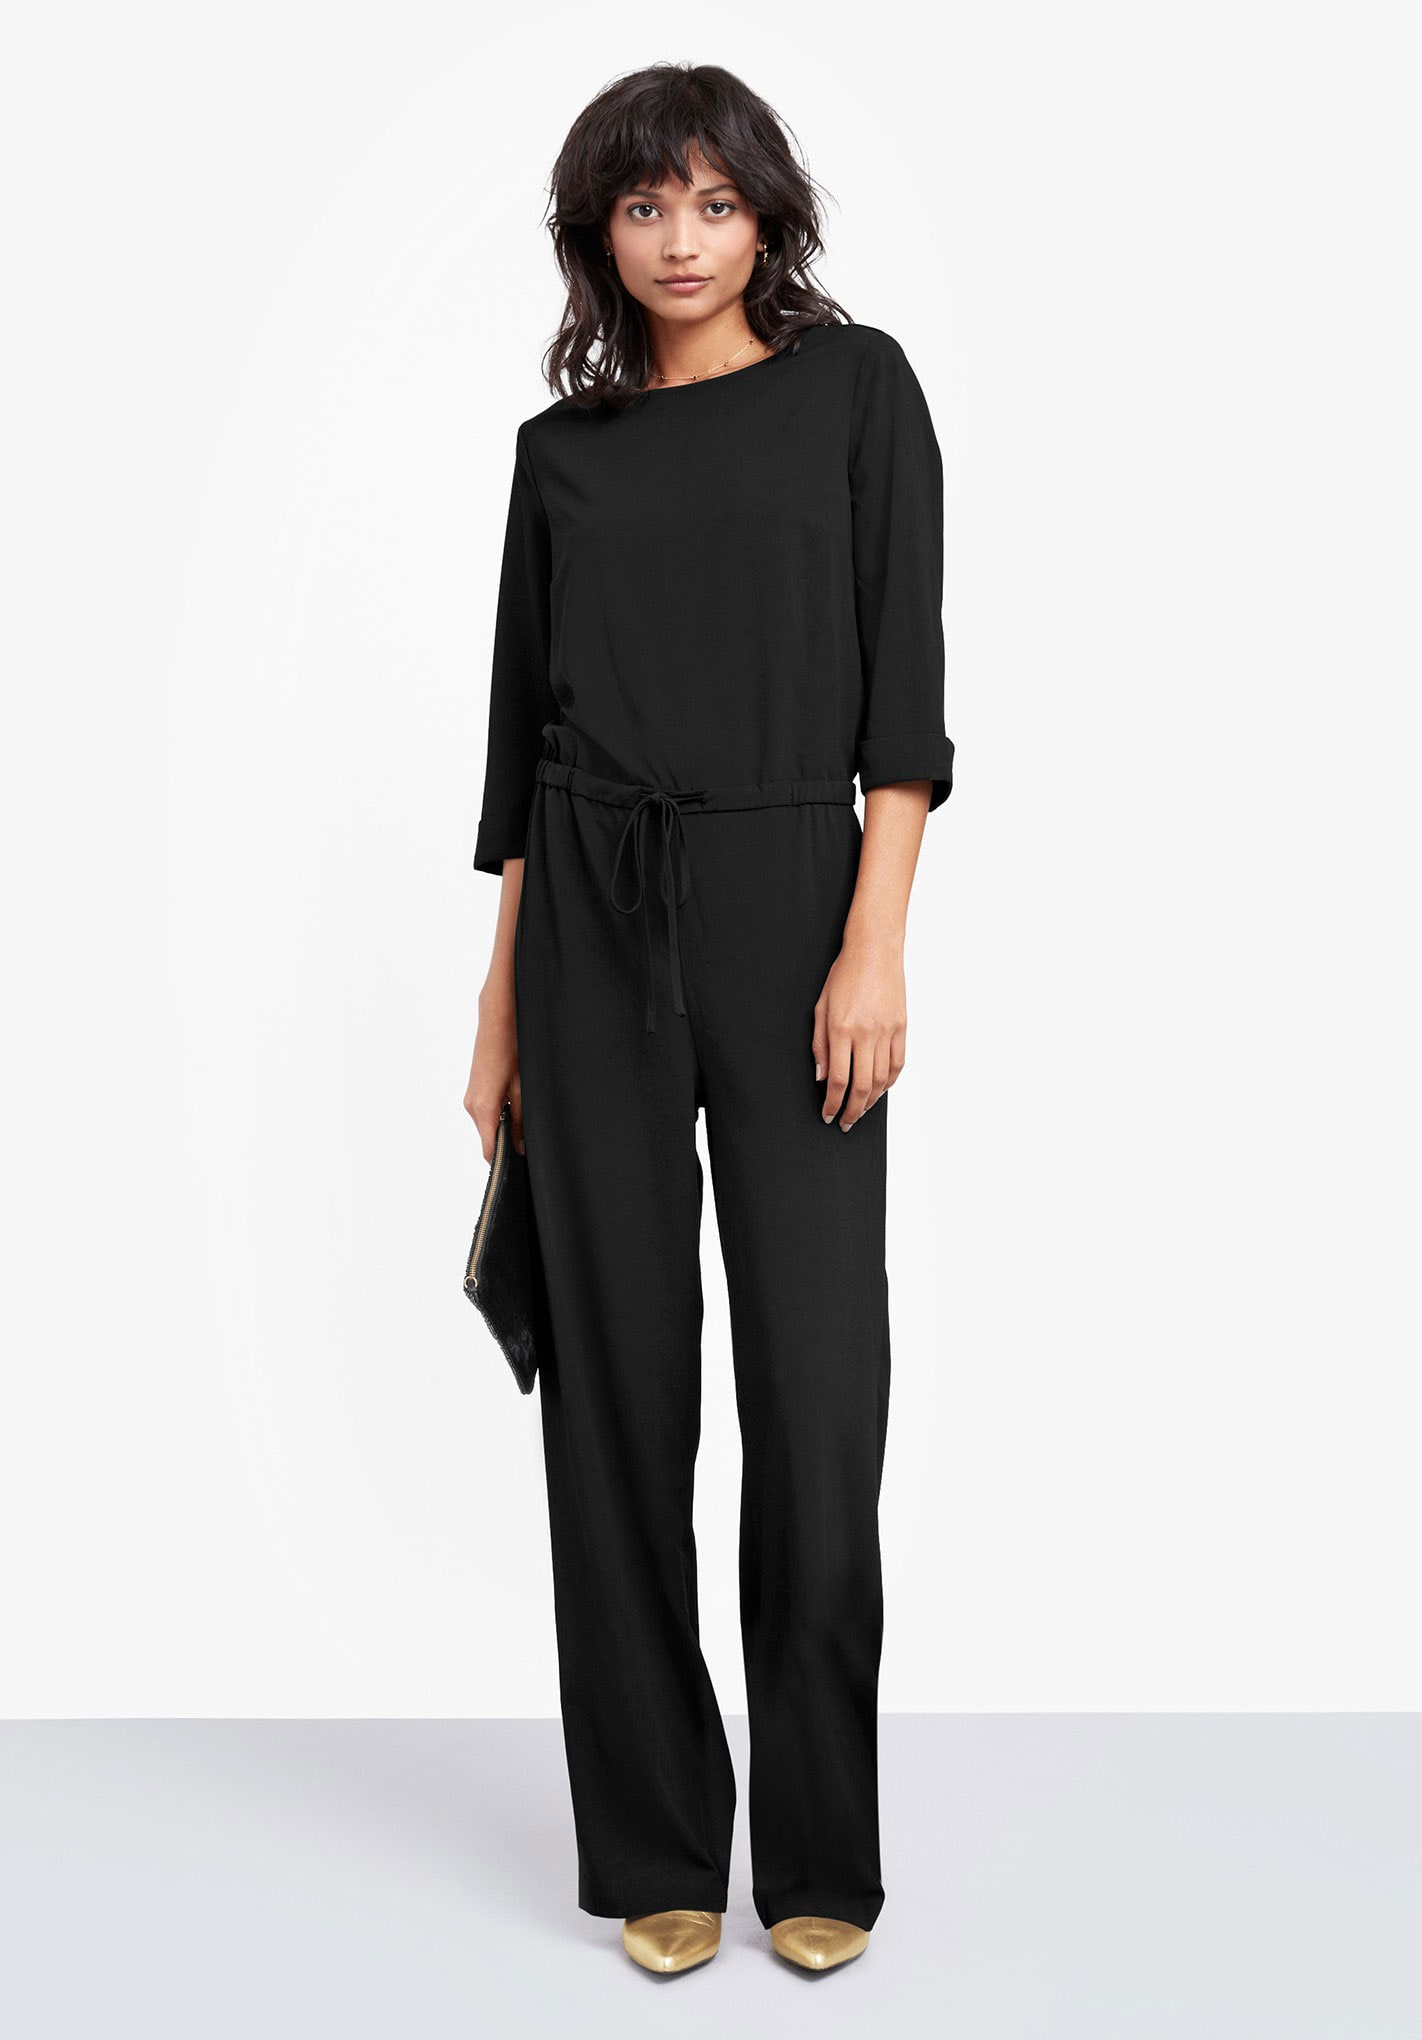 hush vivian jumpsuit £95